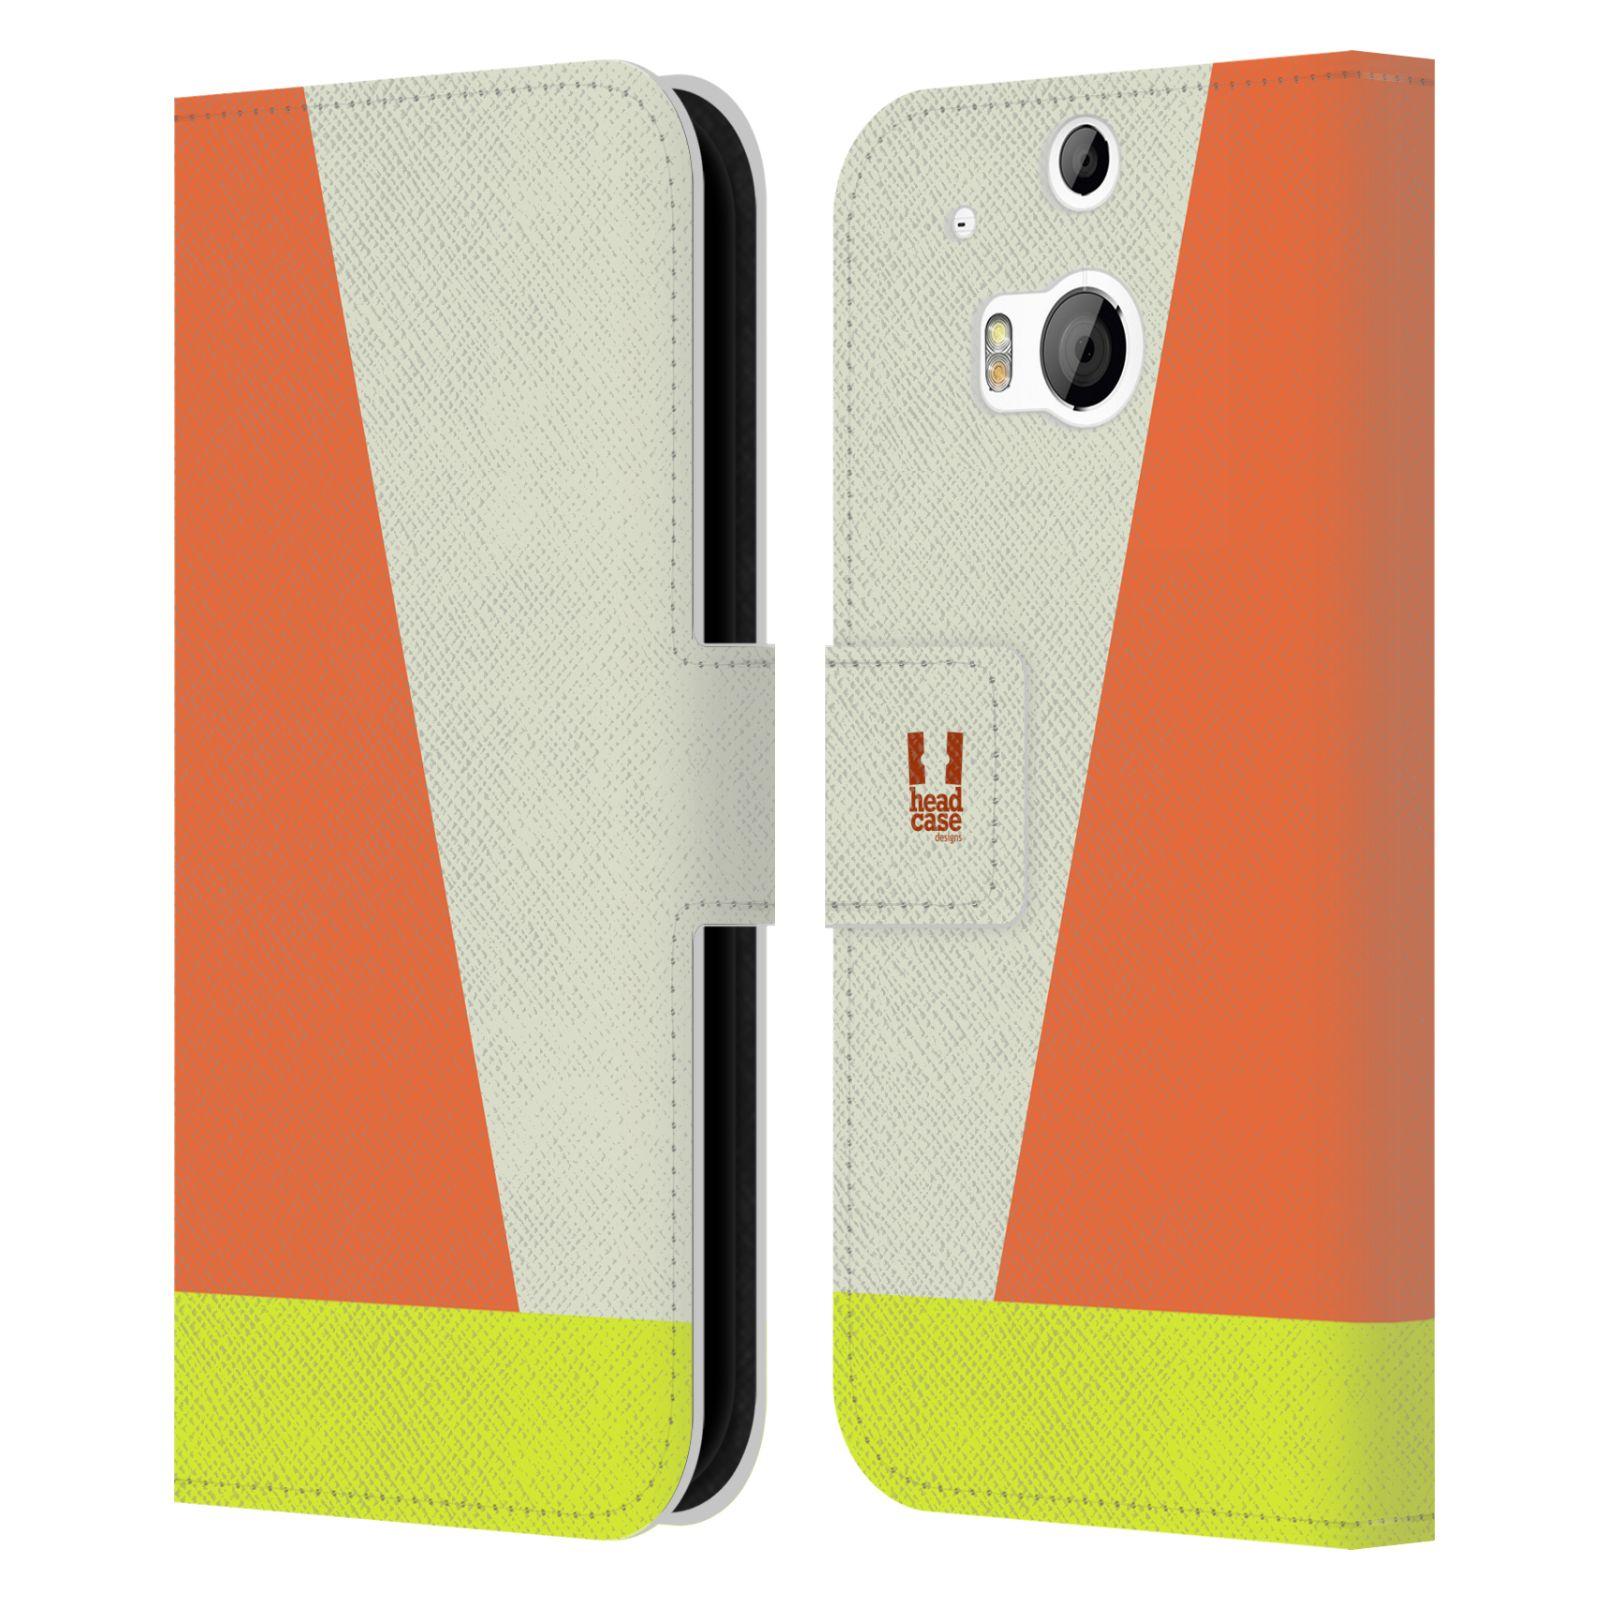 HEAD CASE Flipové pouzdro pro mobil HTC ONE M8/M8s barevné tvary slonová kost